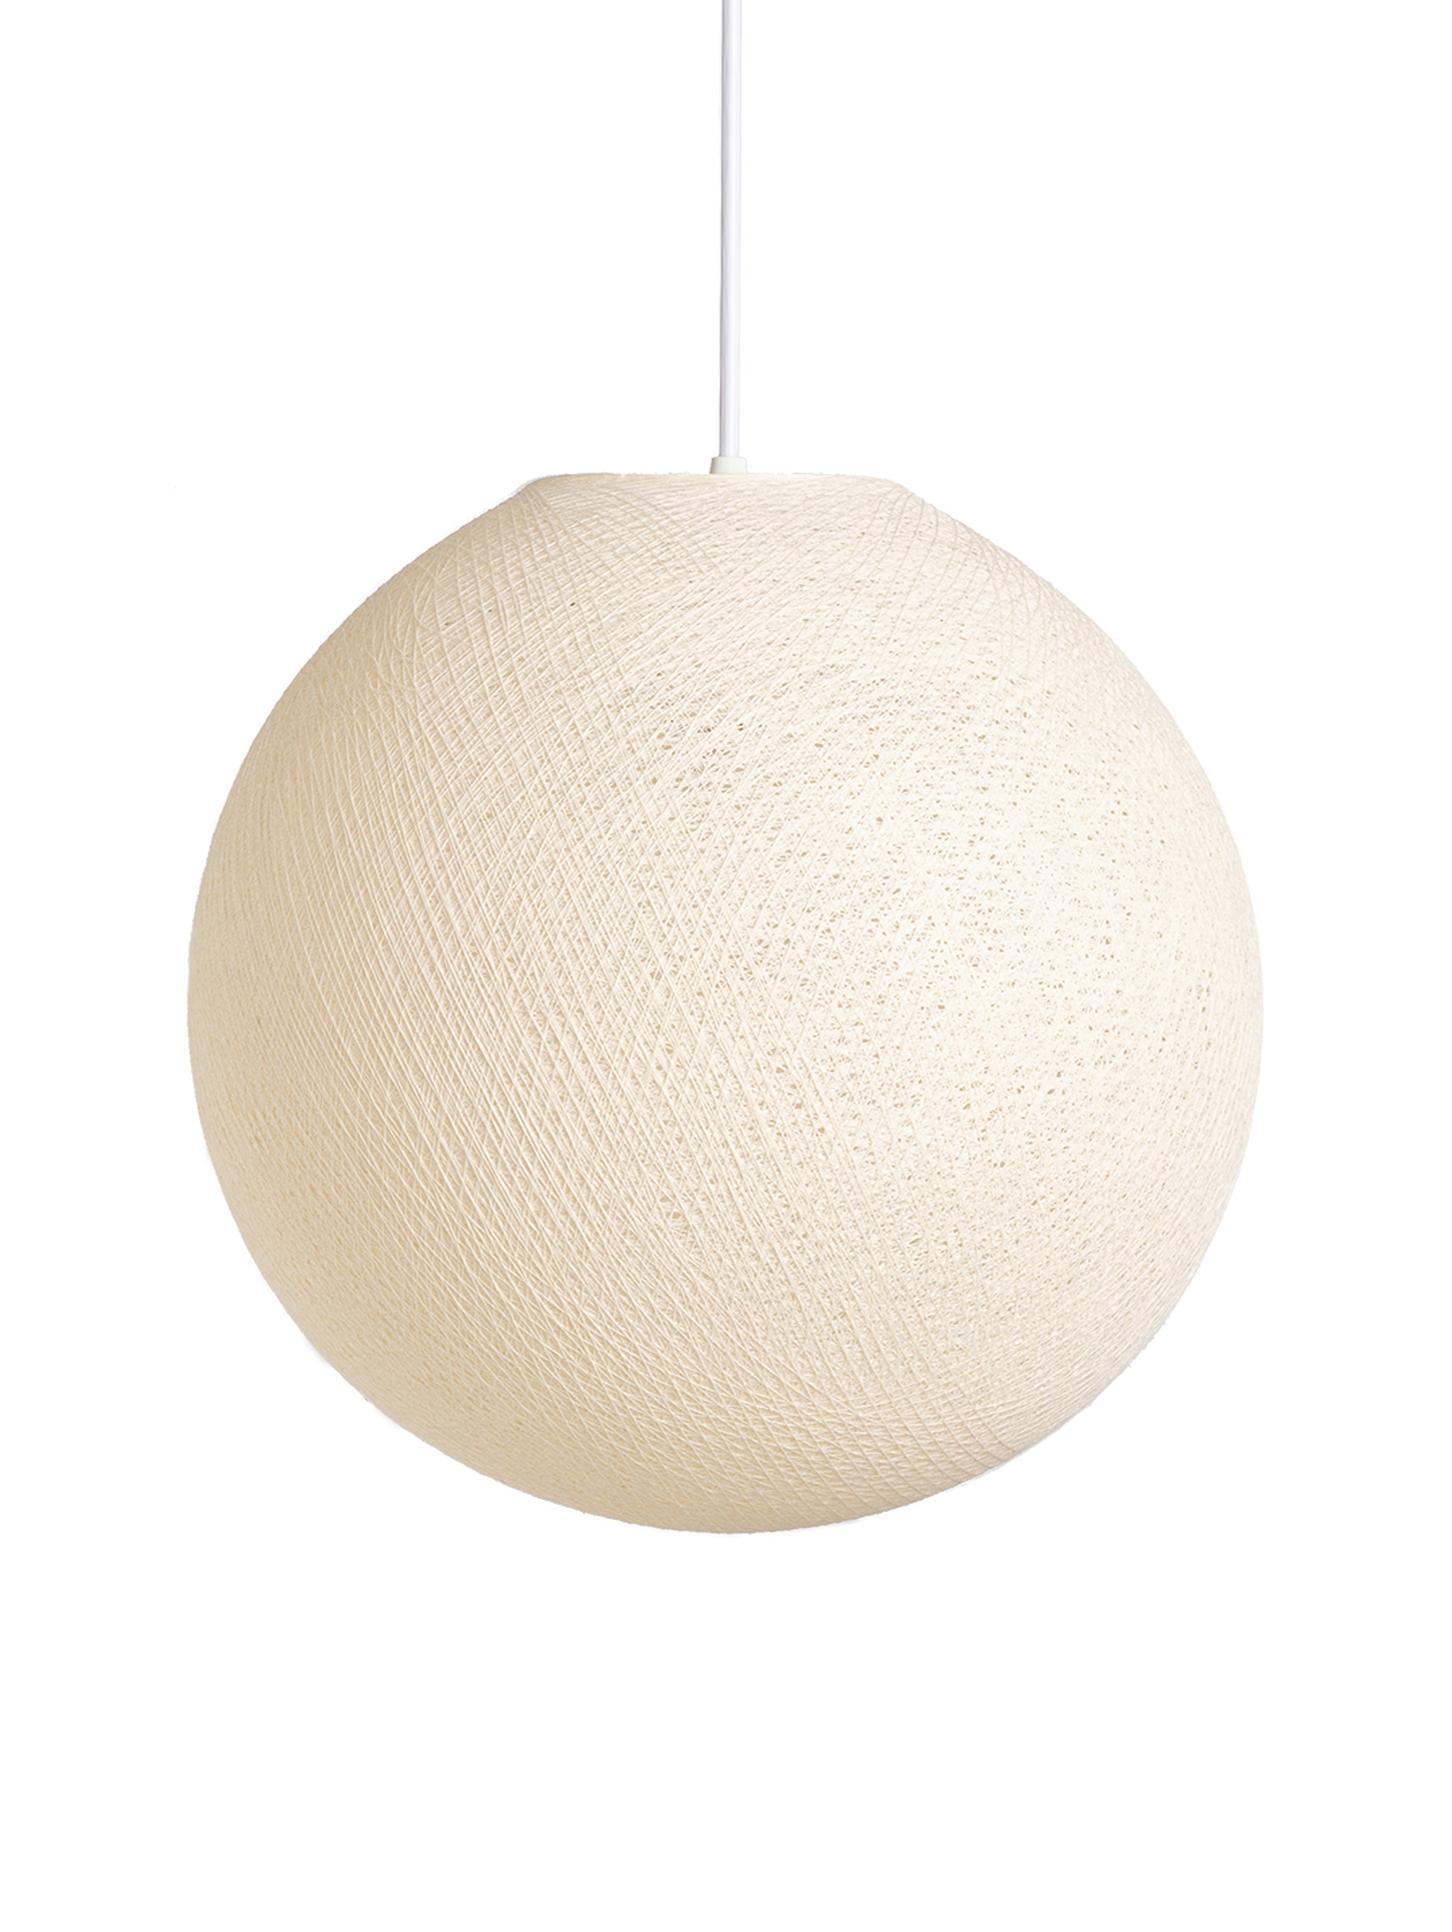 Pendelleuchte Colorain, Lampenschirm: Polyester, Beige, Ø 41 x H 135 cm